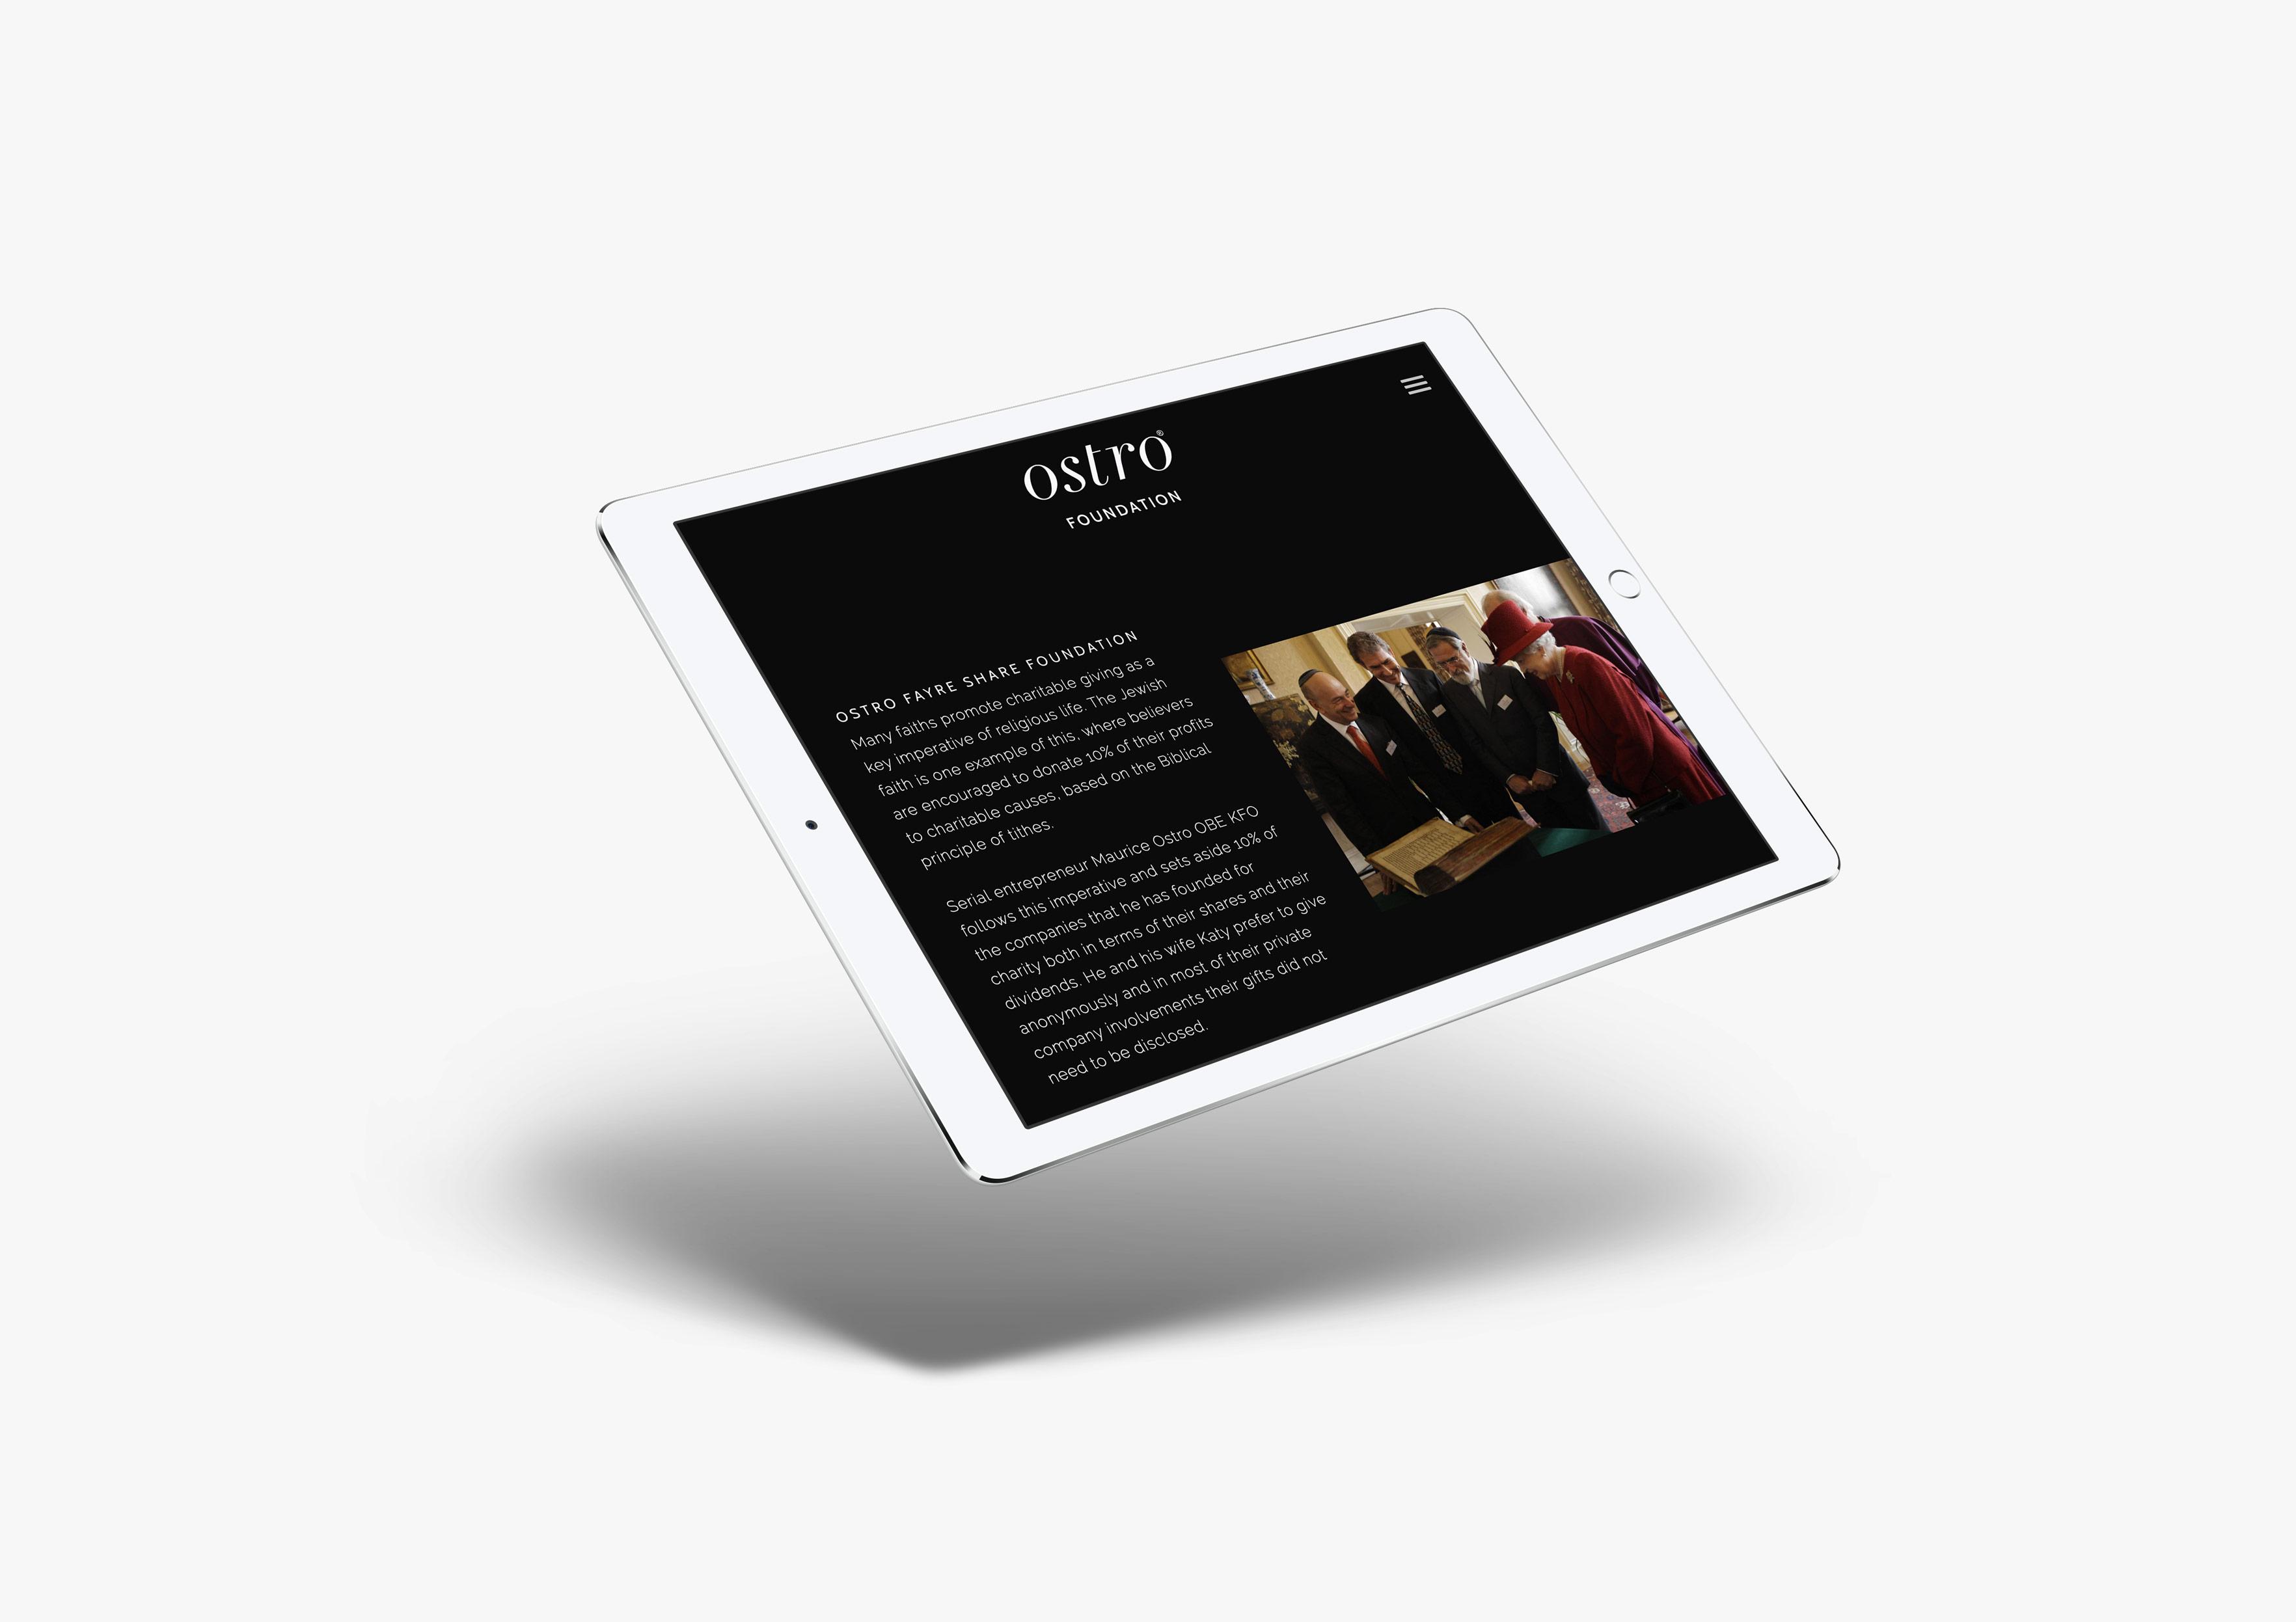 ostro ipad mockup website mobile responsive